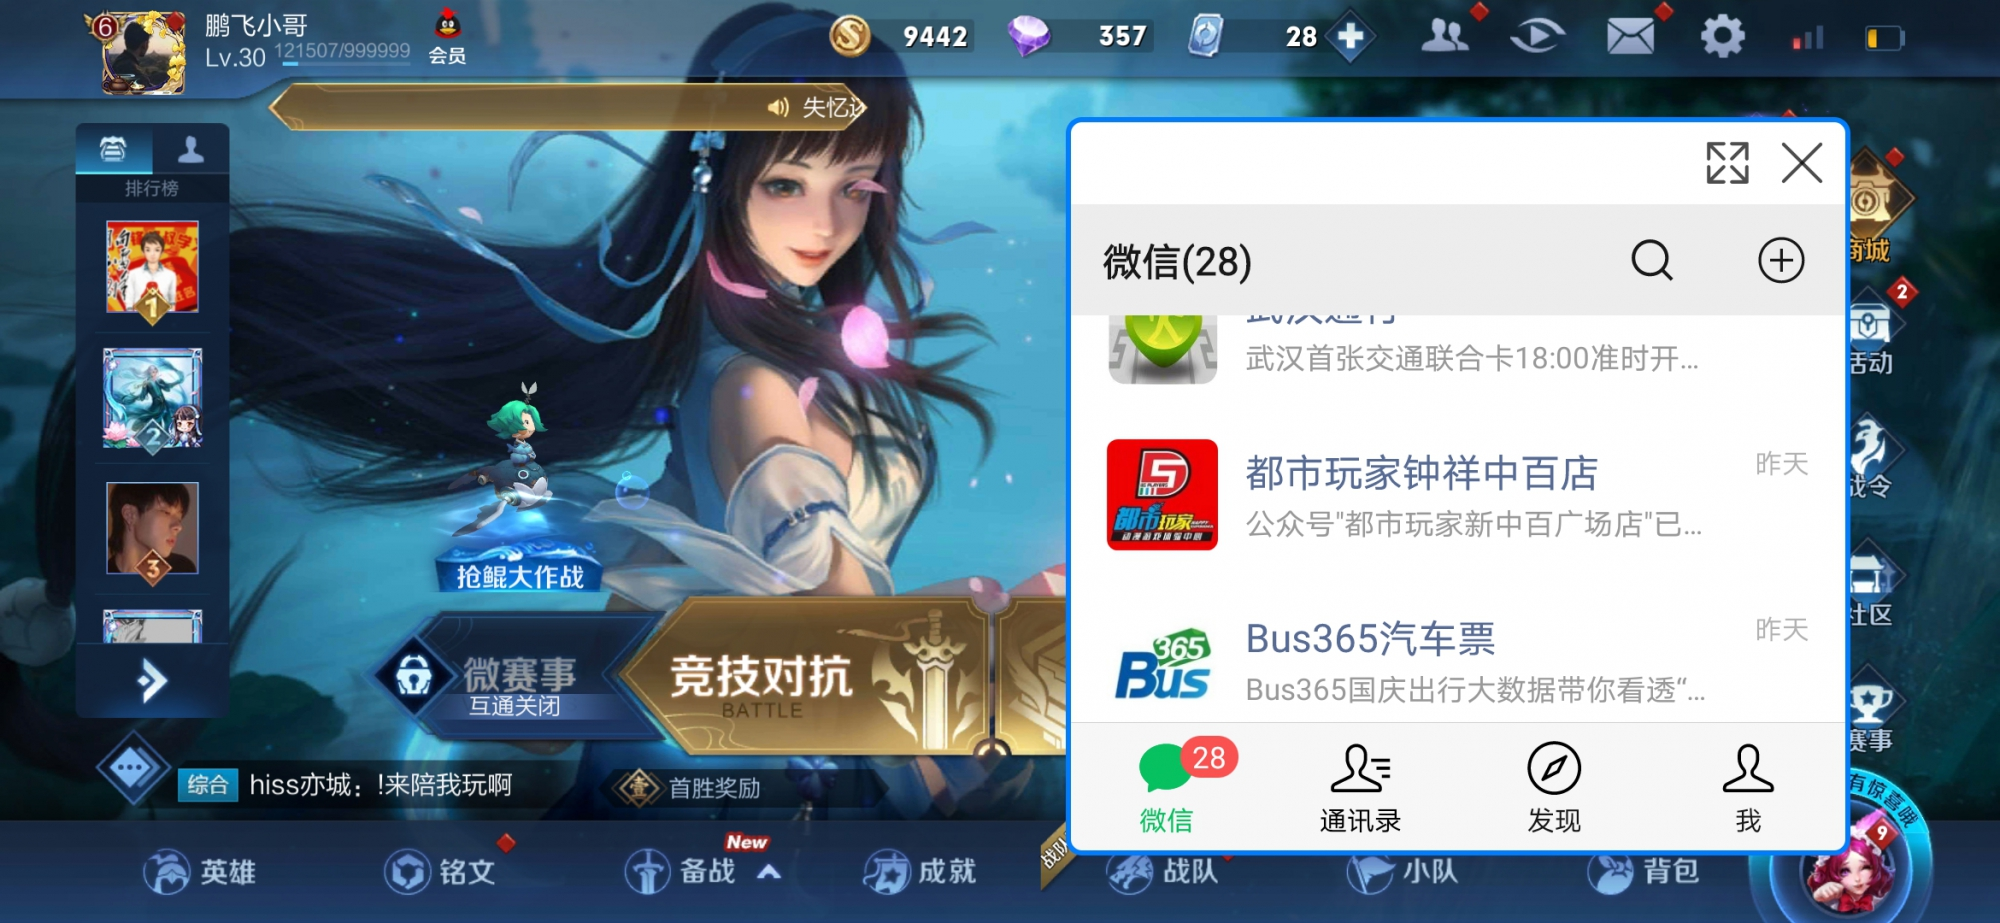 Screenshot_20191012_144955_com.tencent.mm.jpg